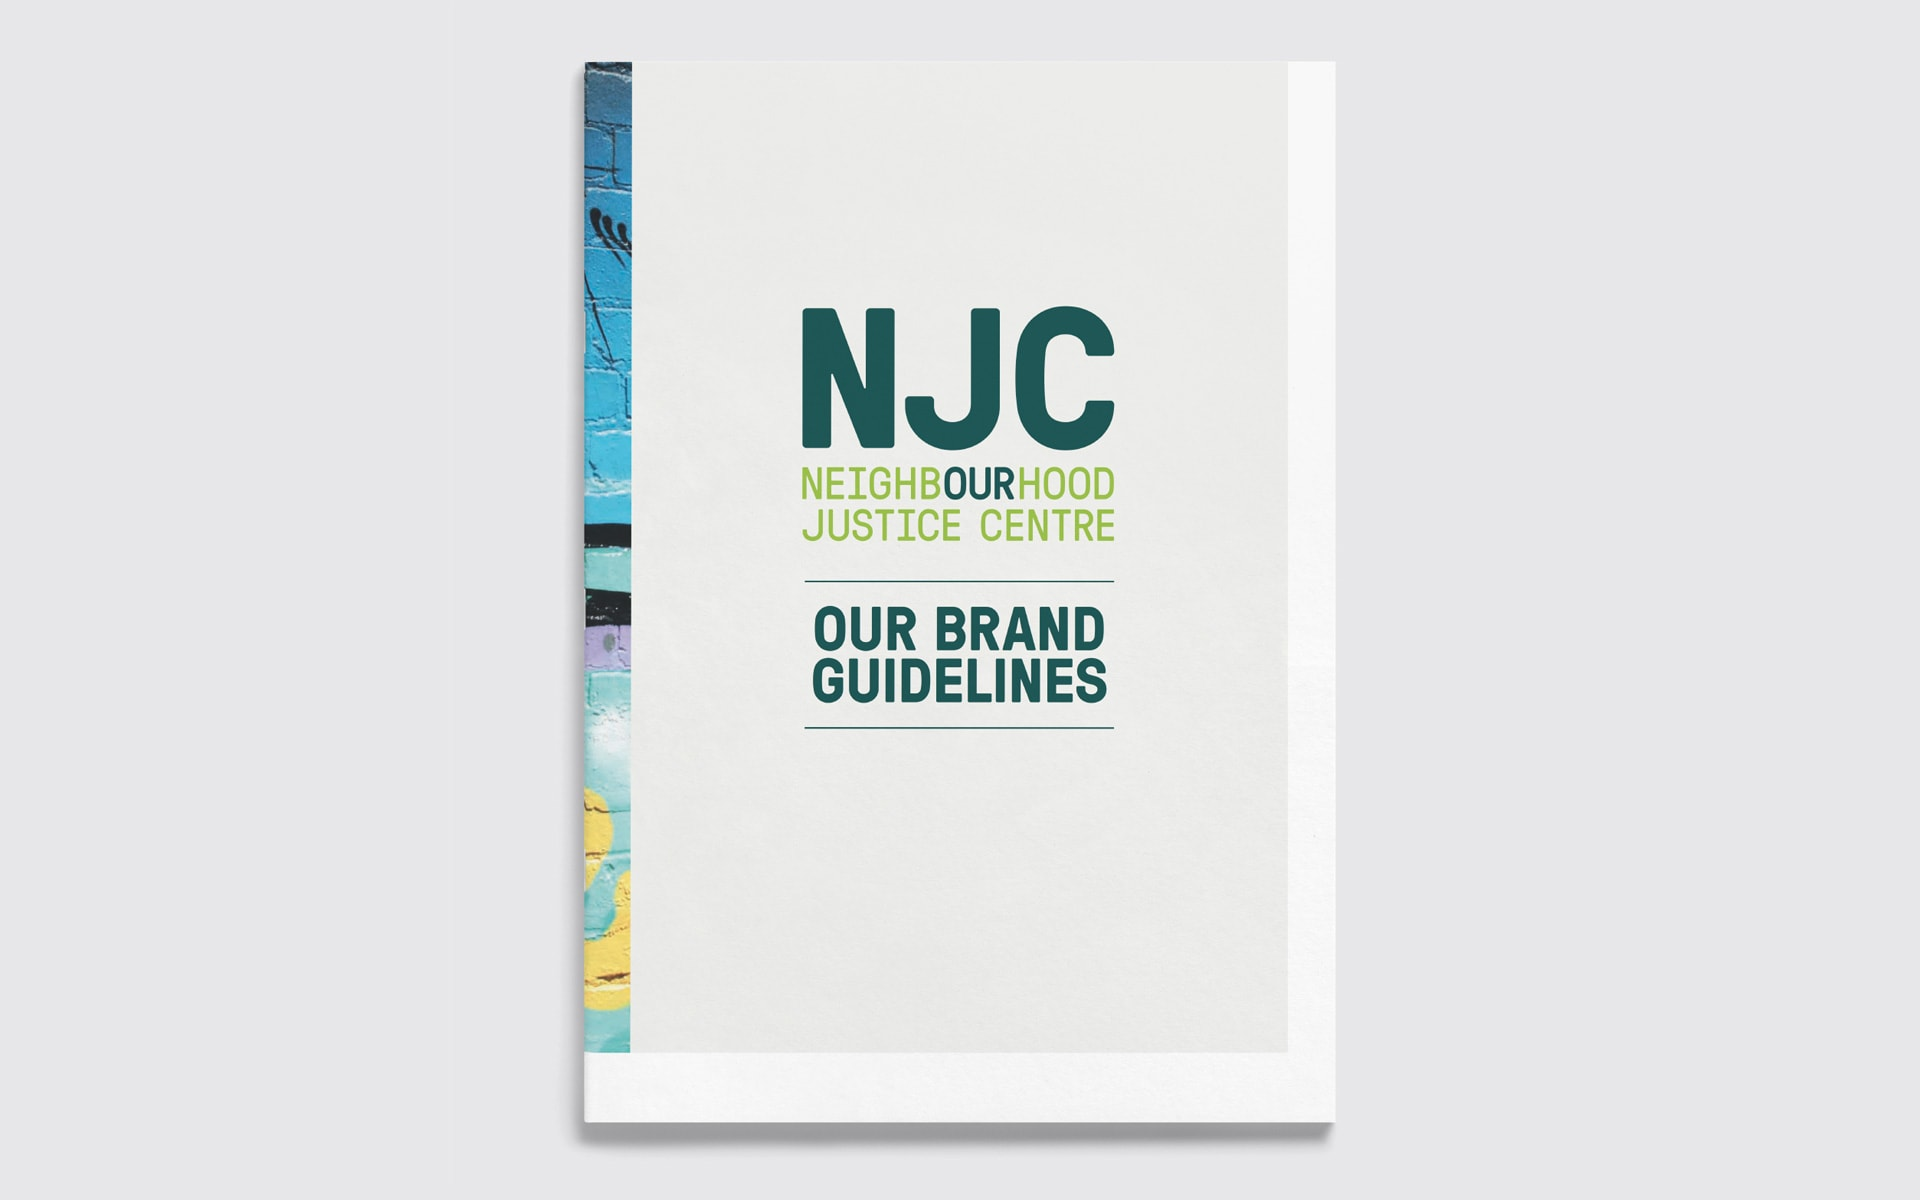 neighbourhood-justice-centre-brand-guidelines